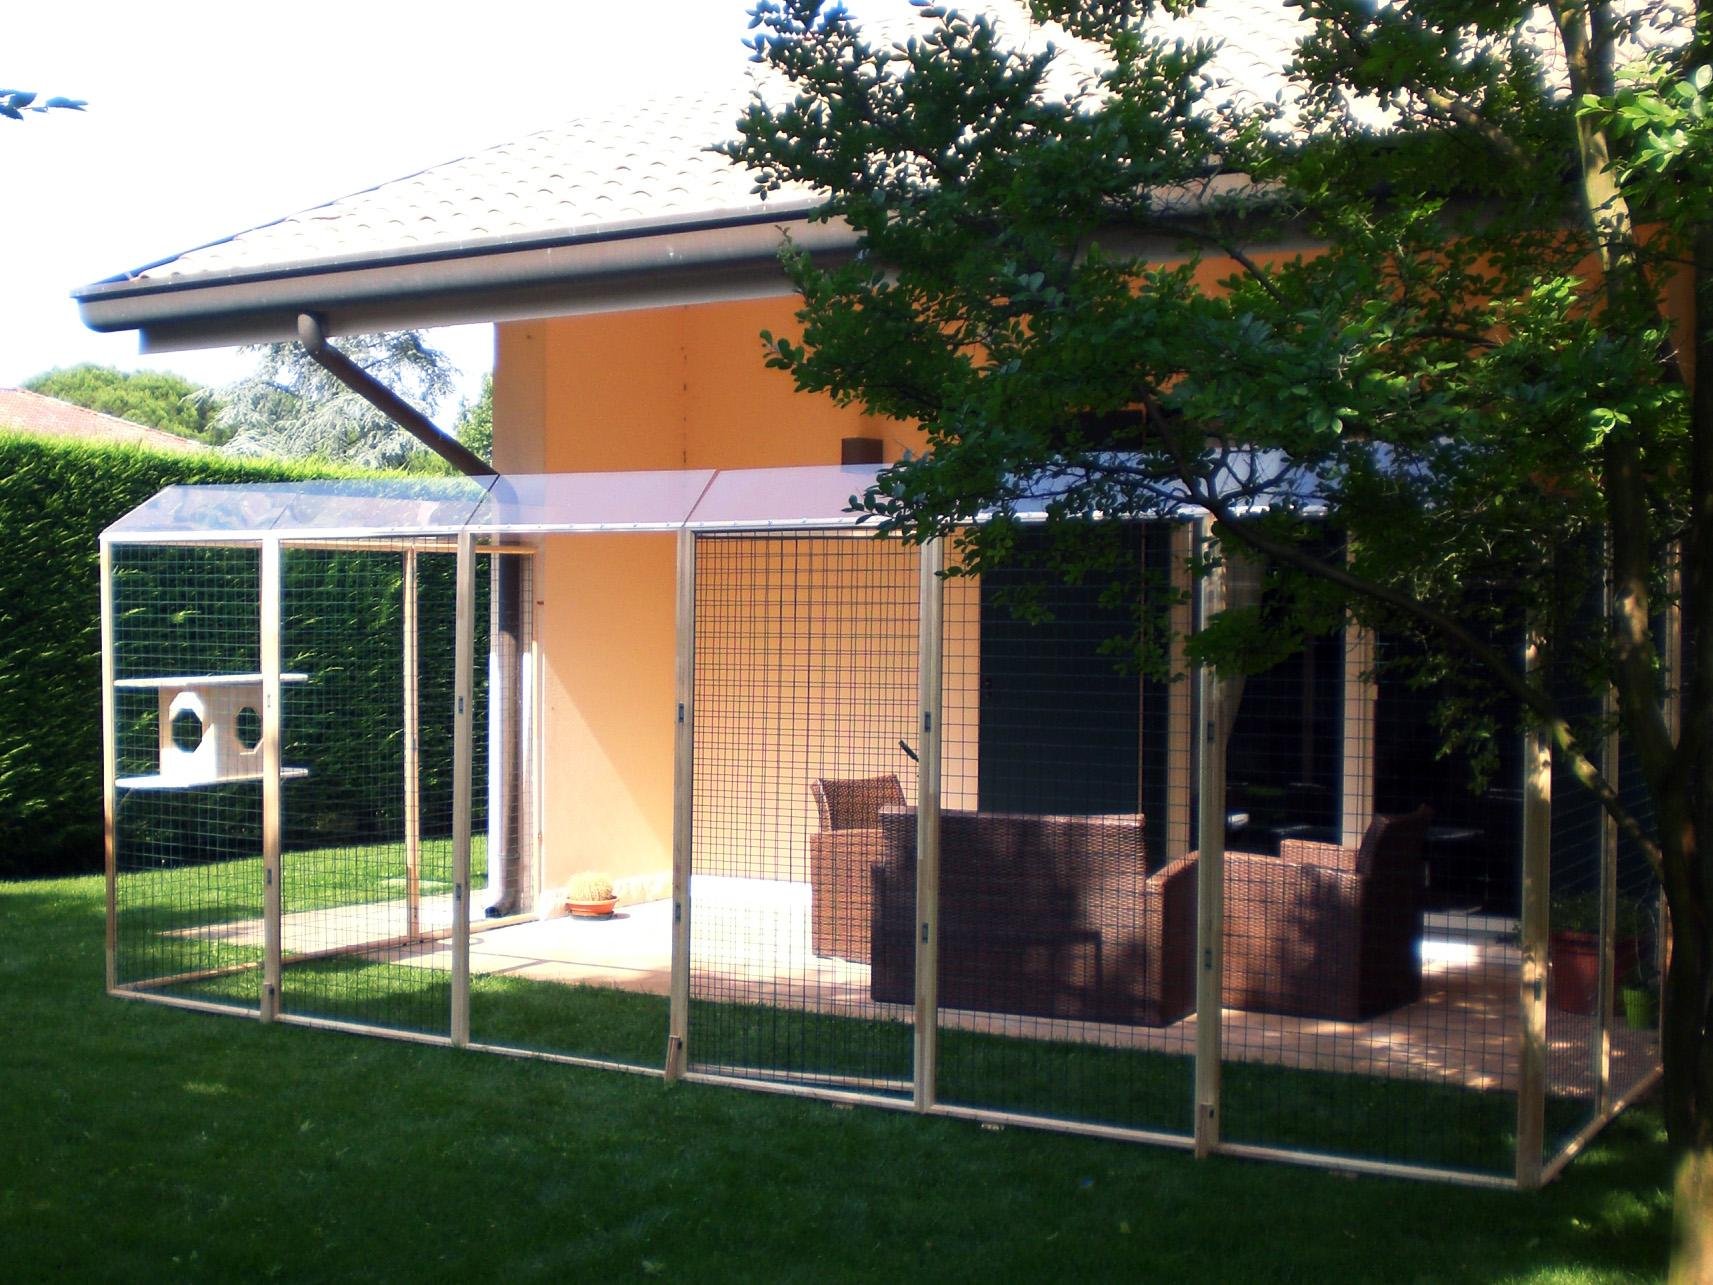 Recinti addossati alla parete di casa per mici by recinto for Recinti per cuccioli di cane in casa